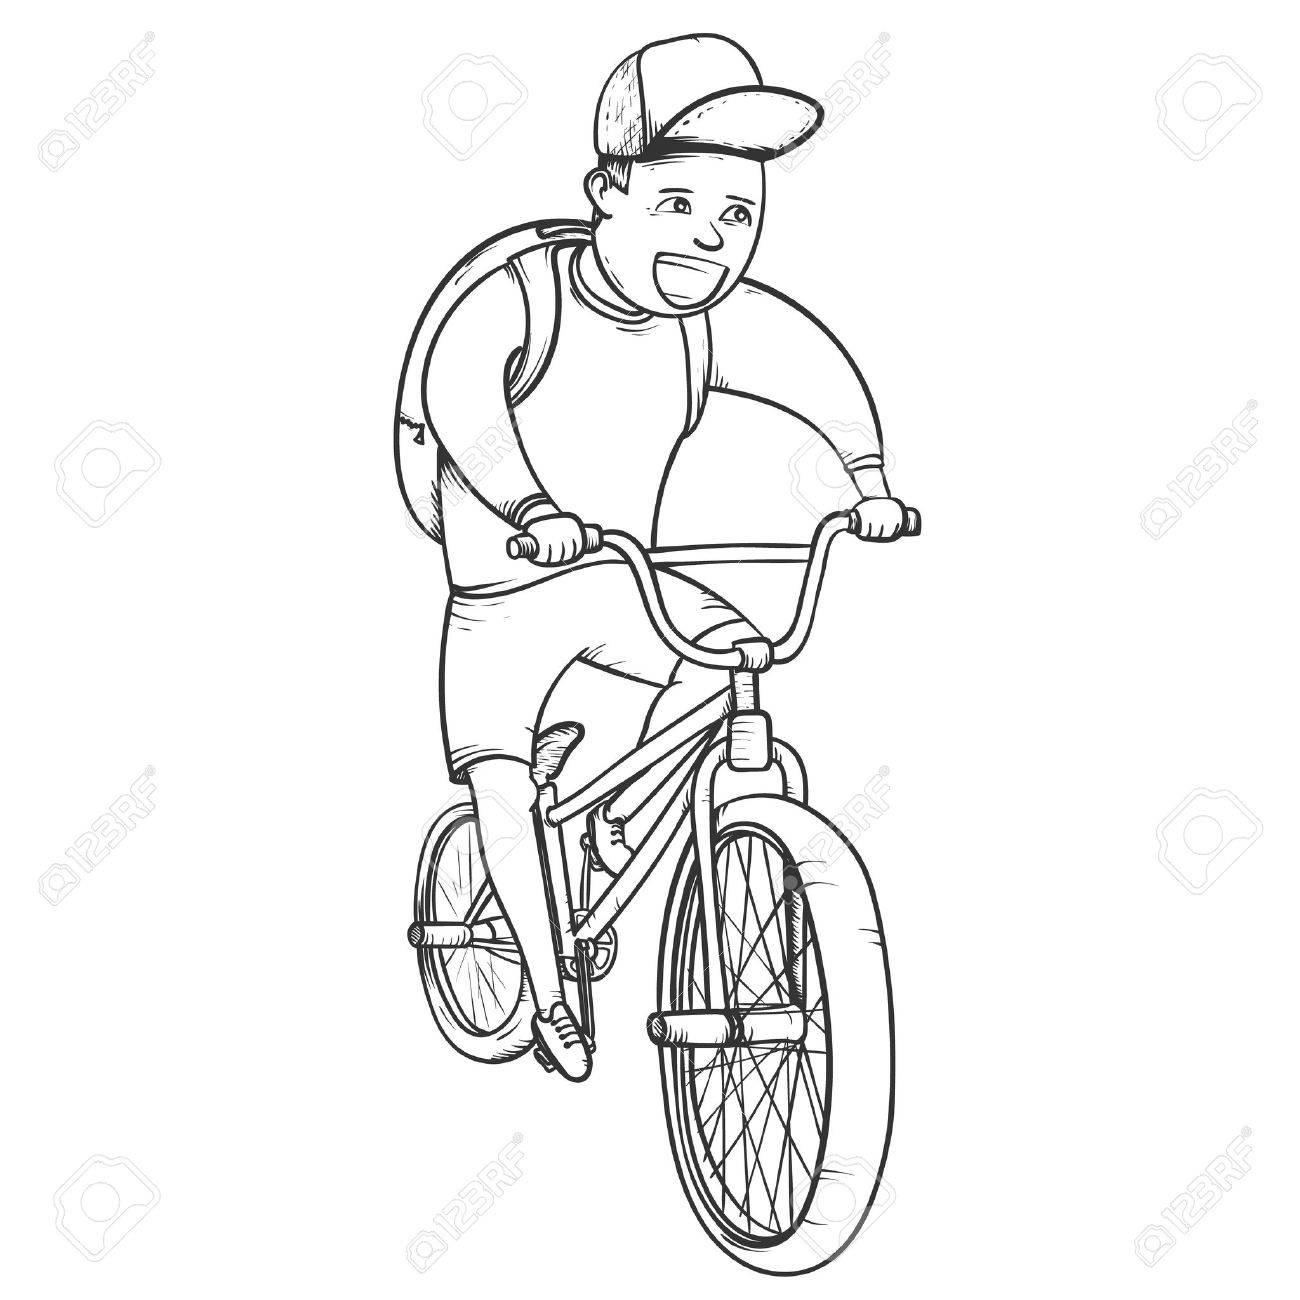 1300x1300 School Boy Riding Bmx Bycicle Hand Drawn Vector Illustration